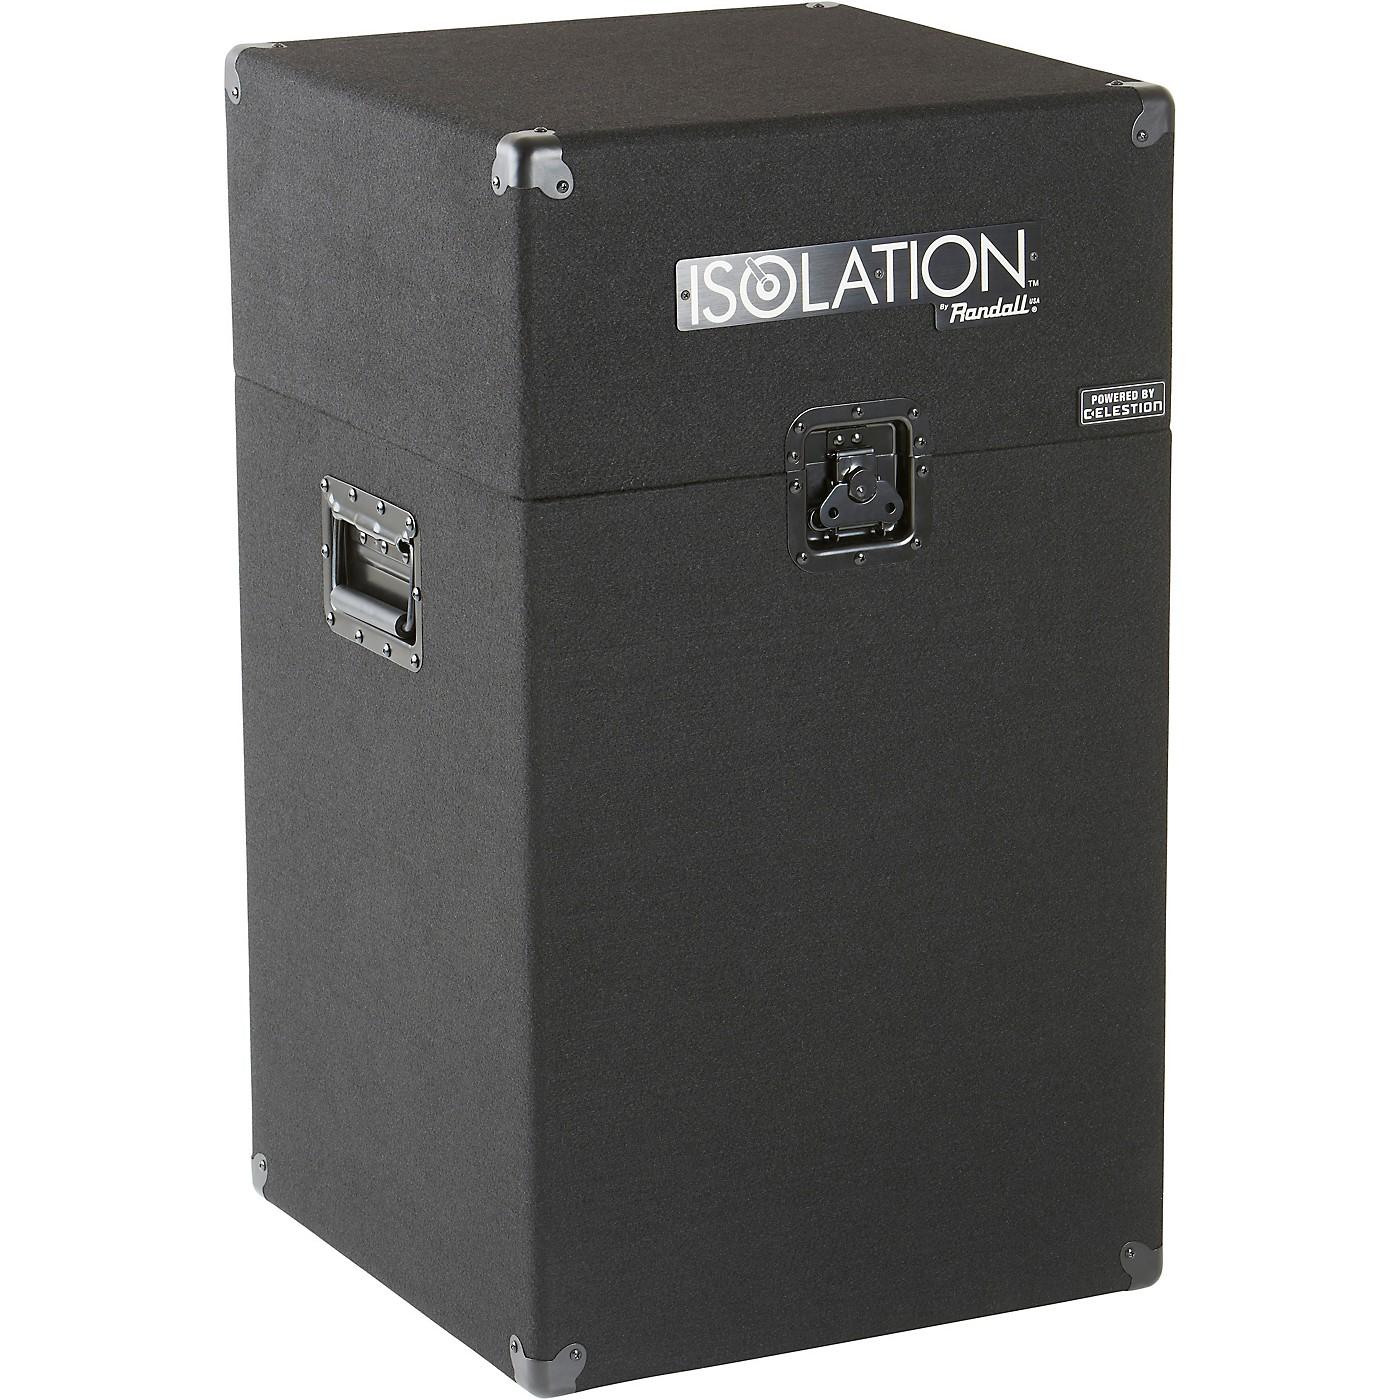 Randall Isolation 12 Speaker Cab thumbnail